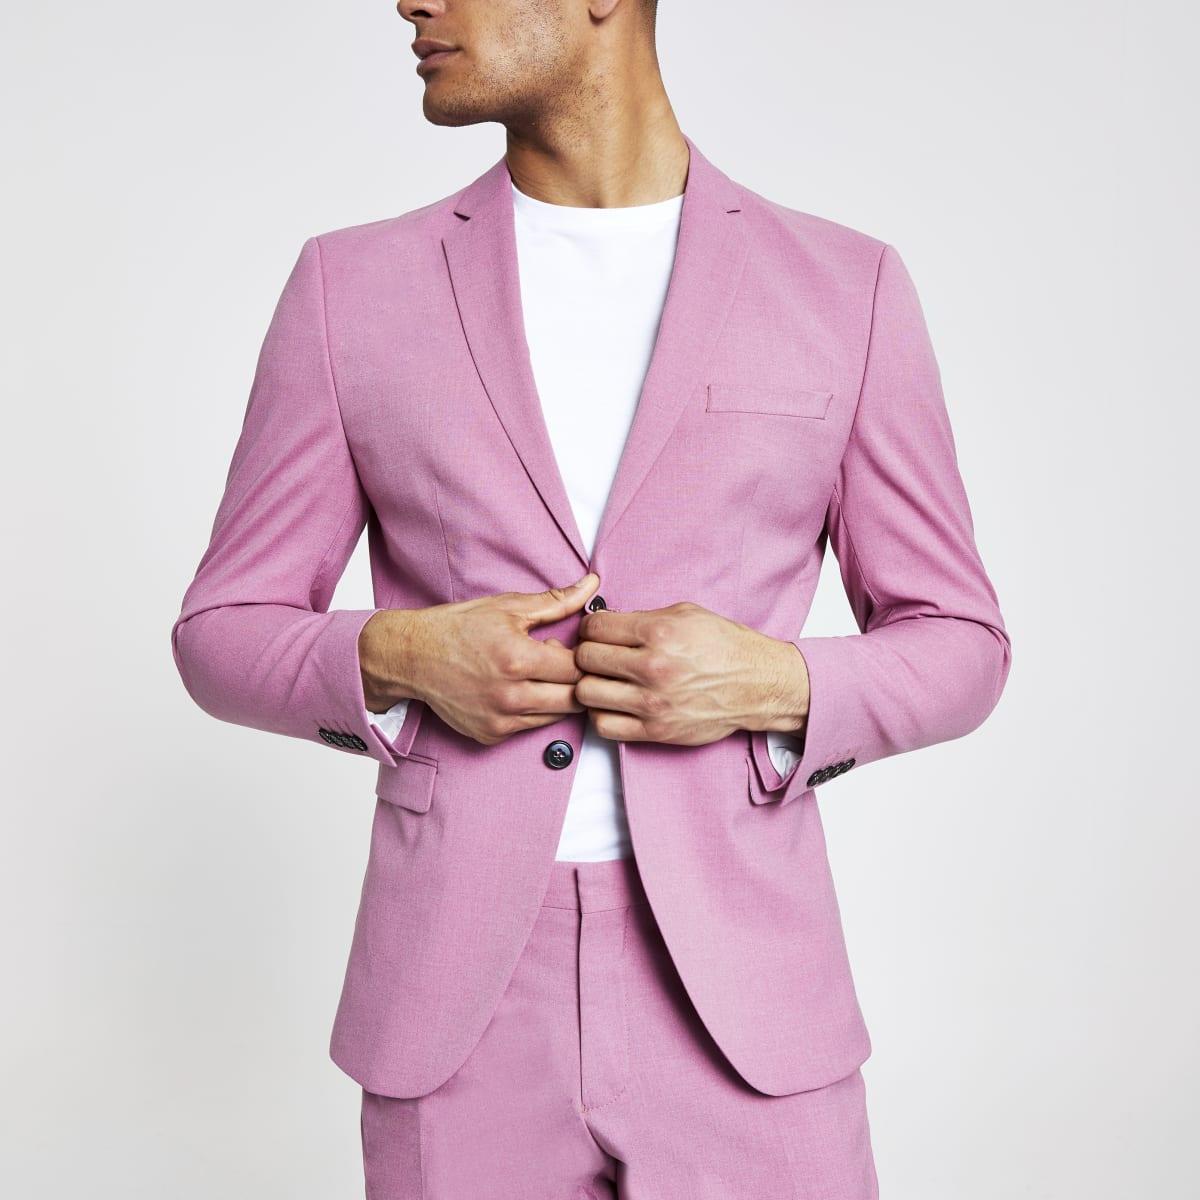 Selected Homme pink slim fit suit jacket